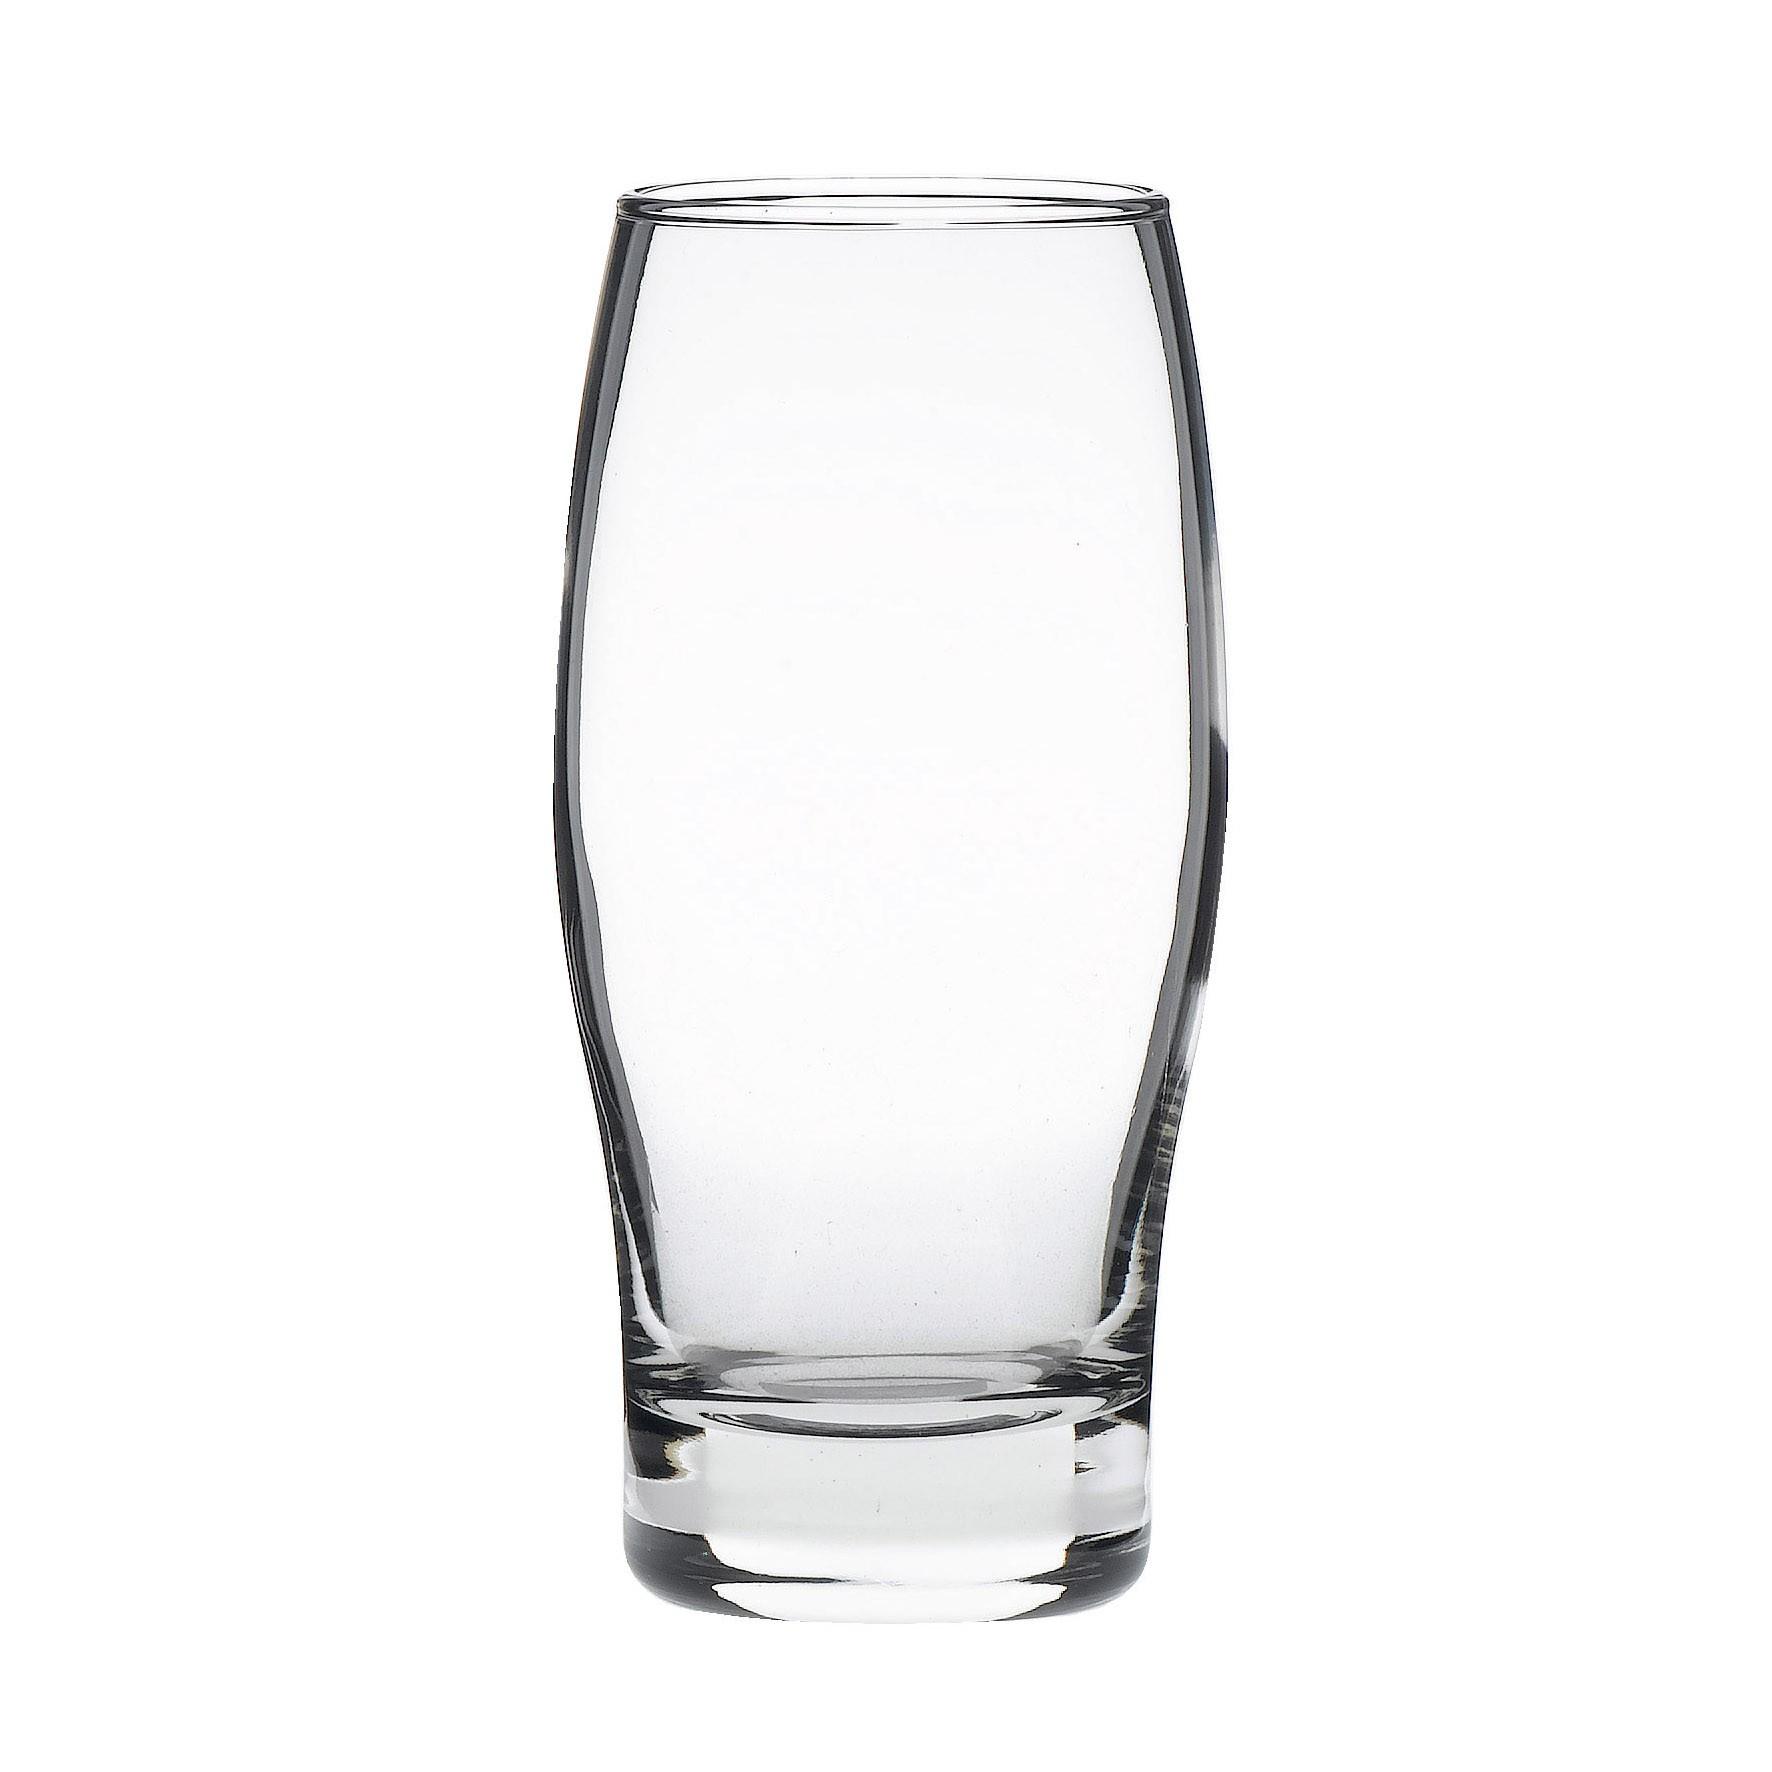 Perception Beverage 40cl 14oz Glass Tumblers